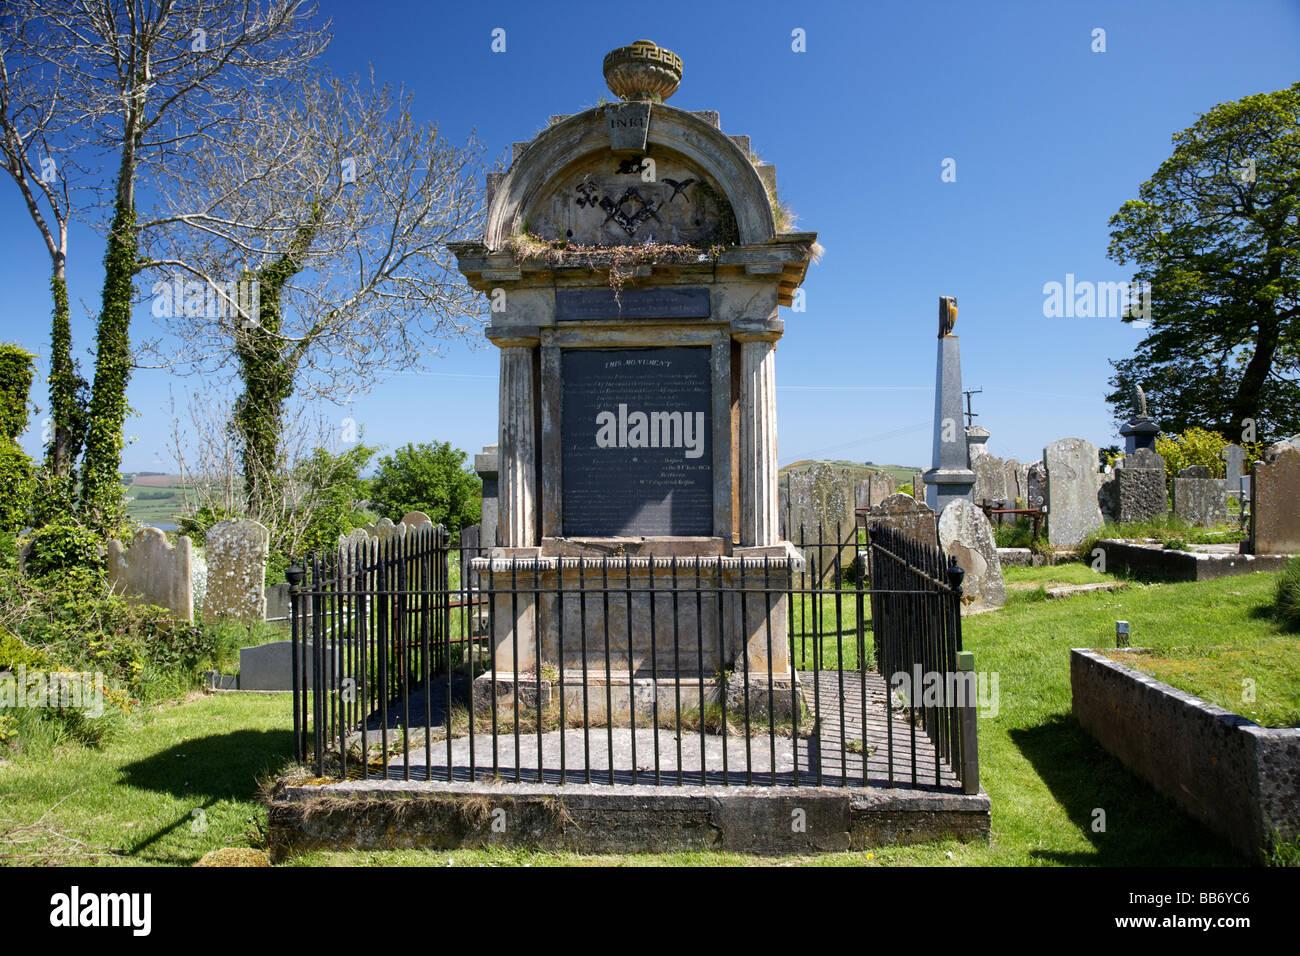 Irish poet James Orr memorial in Templecorran Cemetery Ballycarry county antrim northern ireland uk - Stock Image